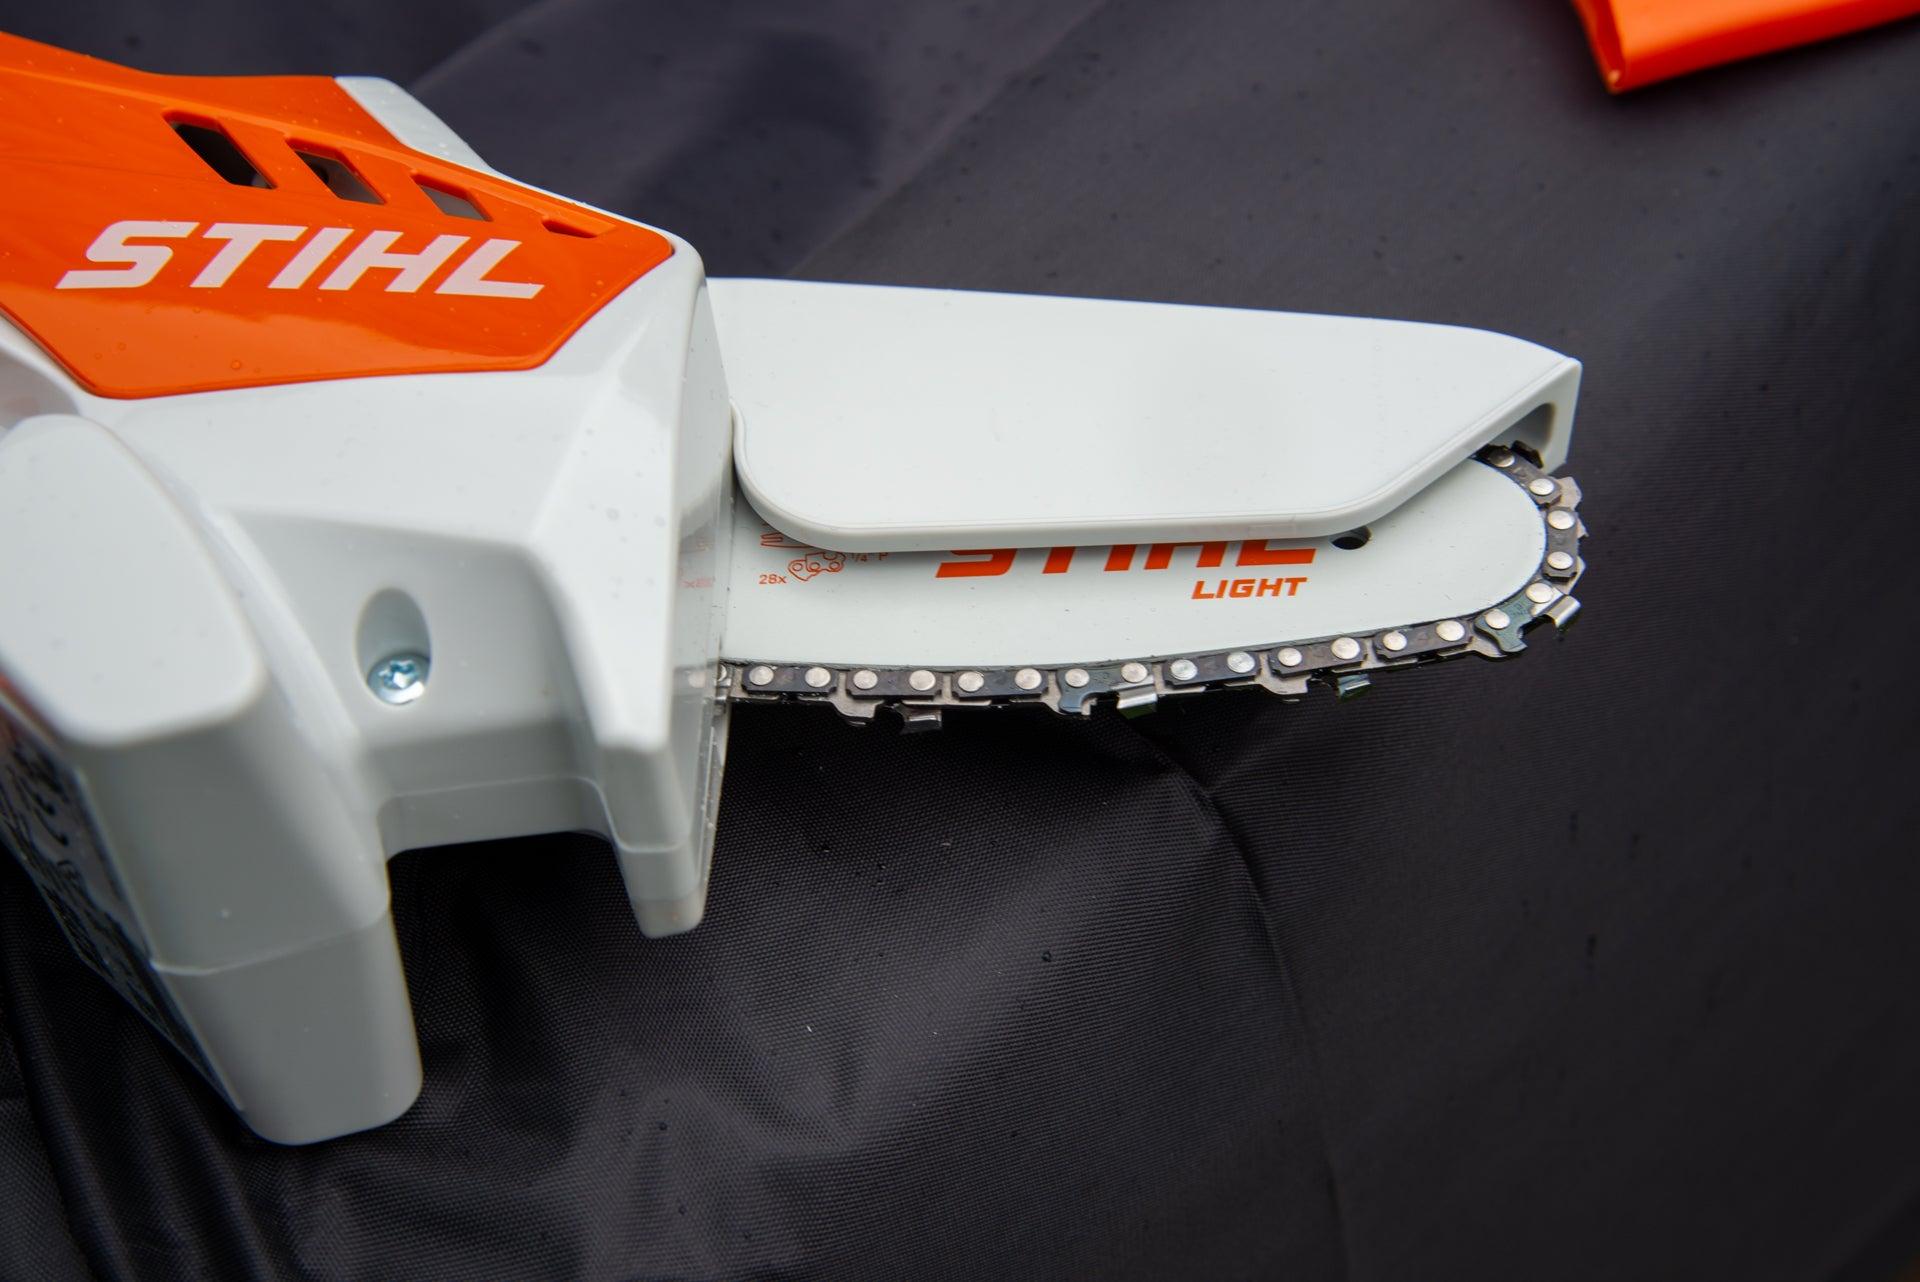 Stihl GTA 26 chain